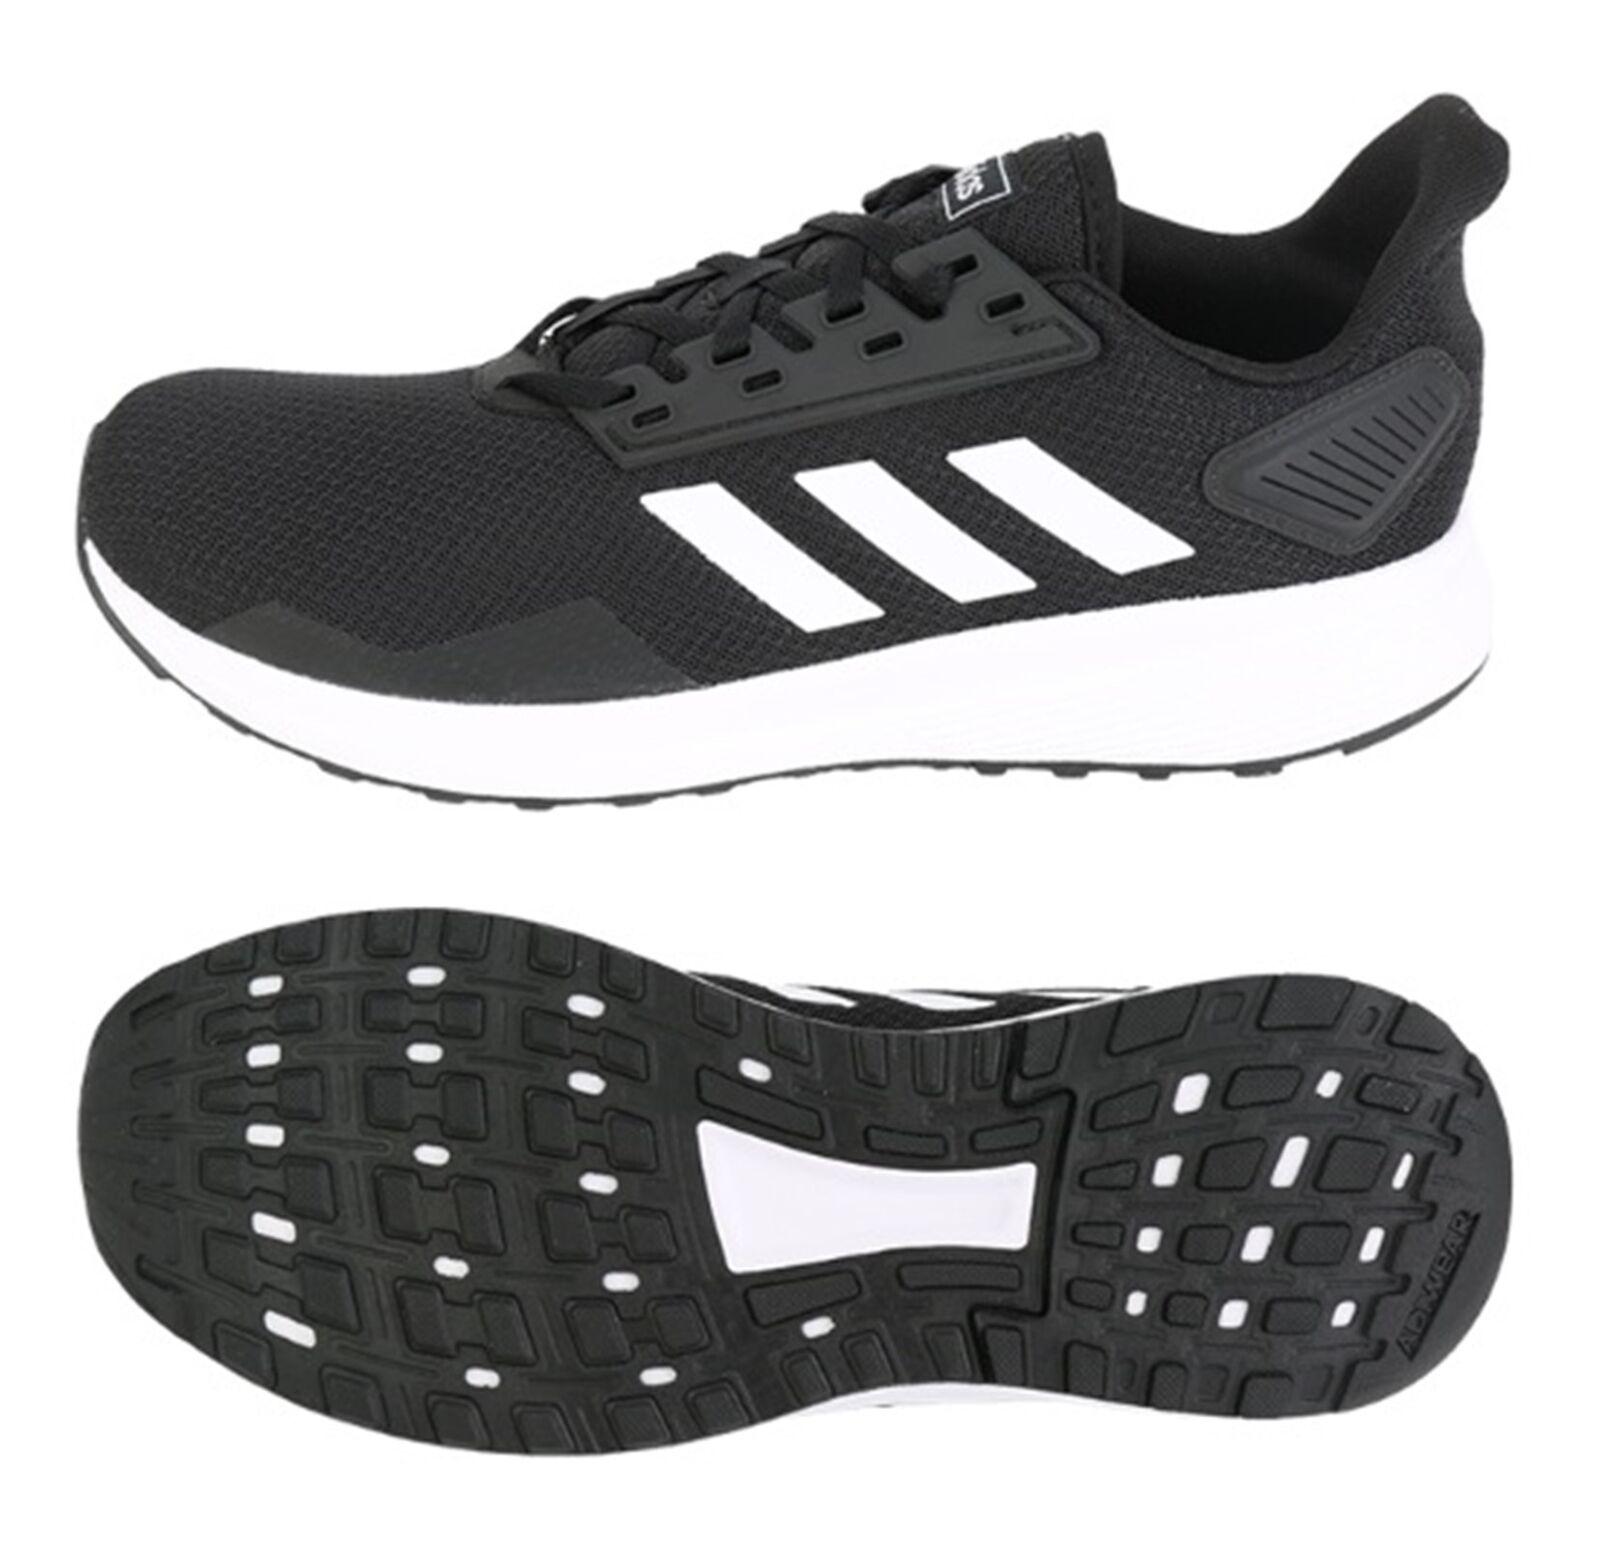 Adidas Hommes Duramo 9 Training Adiwear Chaussures Noir Running Chaussure Baskets BB7066